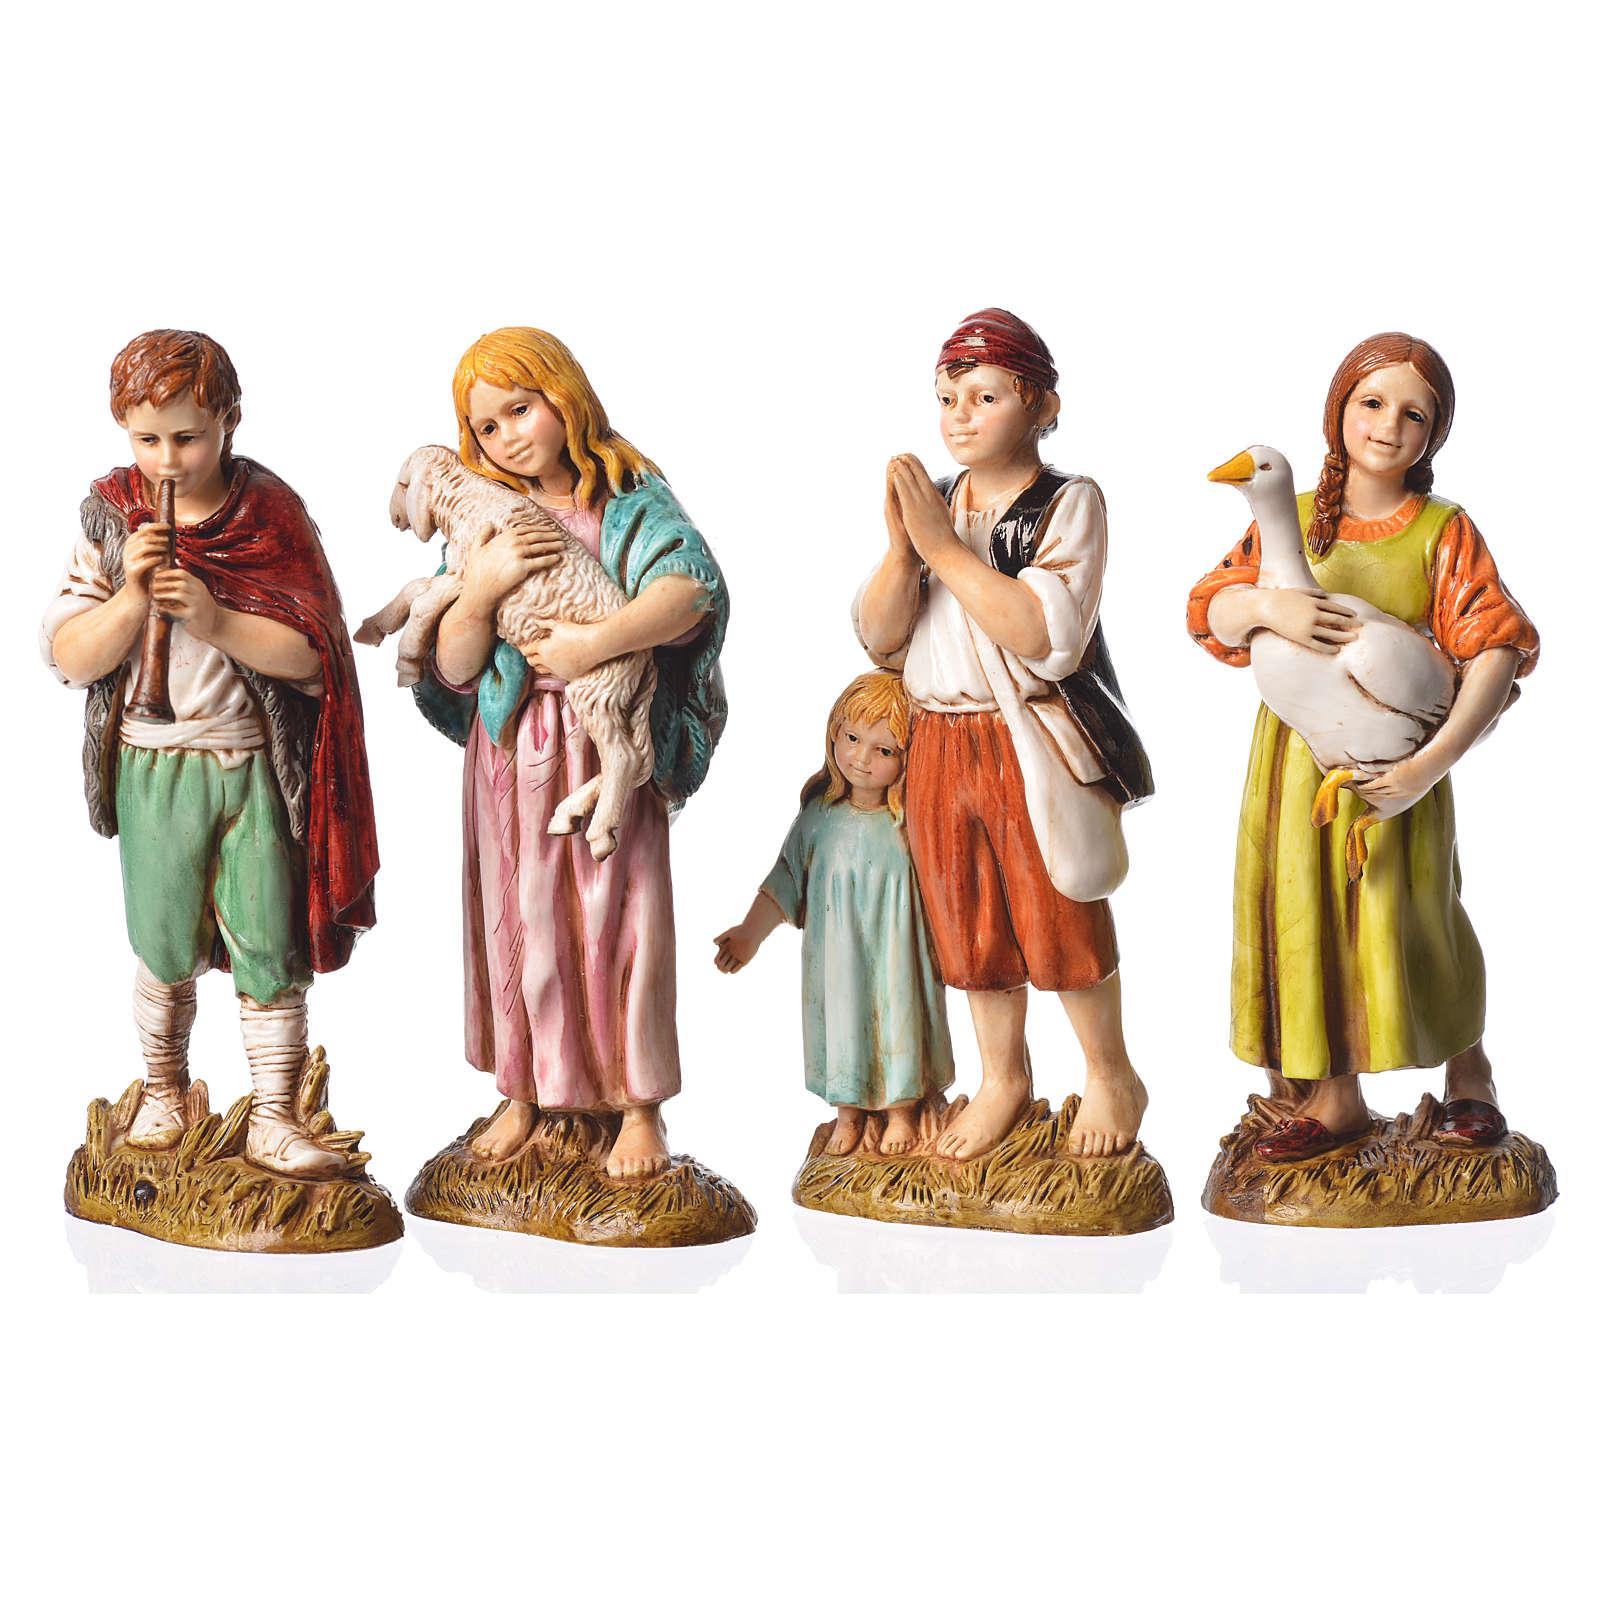 Fanciulli 4 sogg. Presepe 12 cm Moranduzzo 4